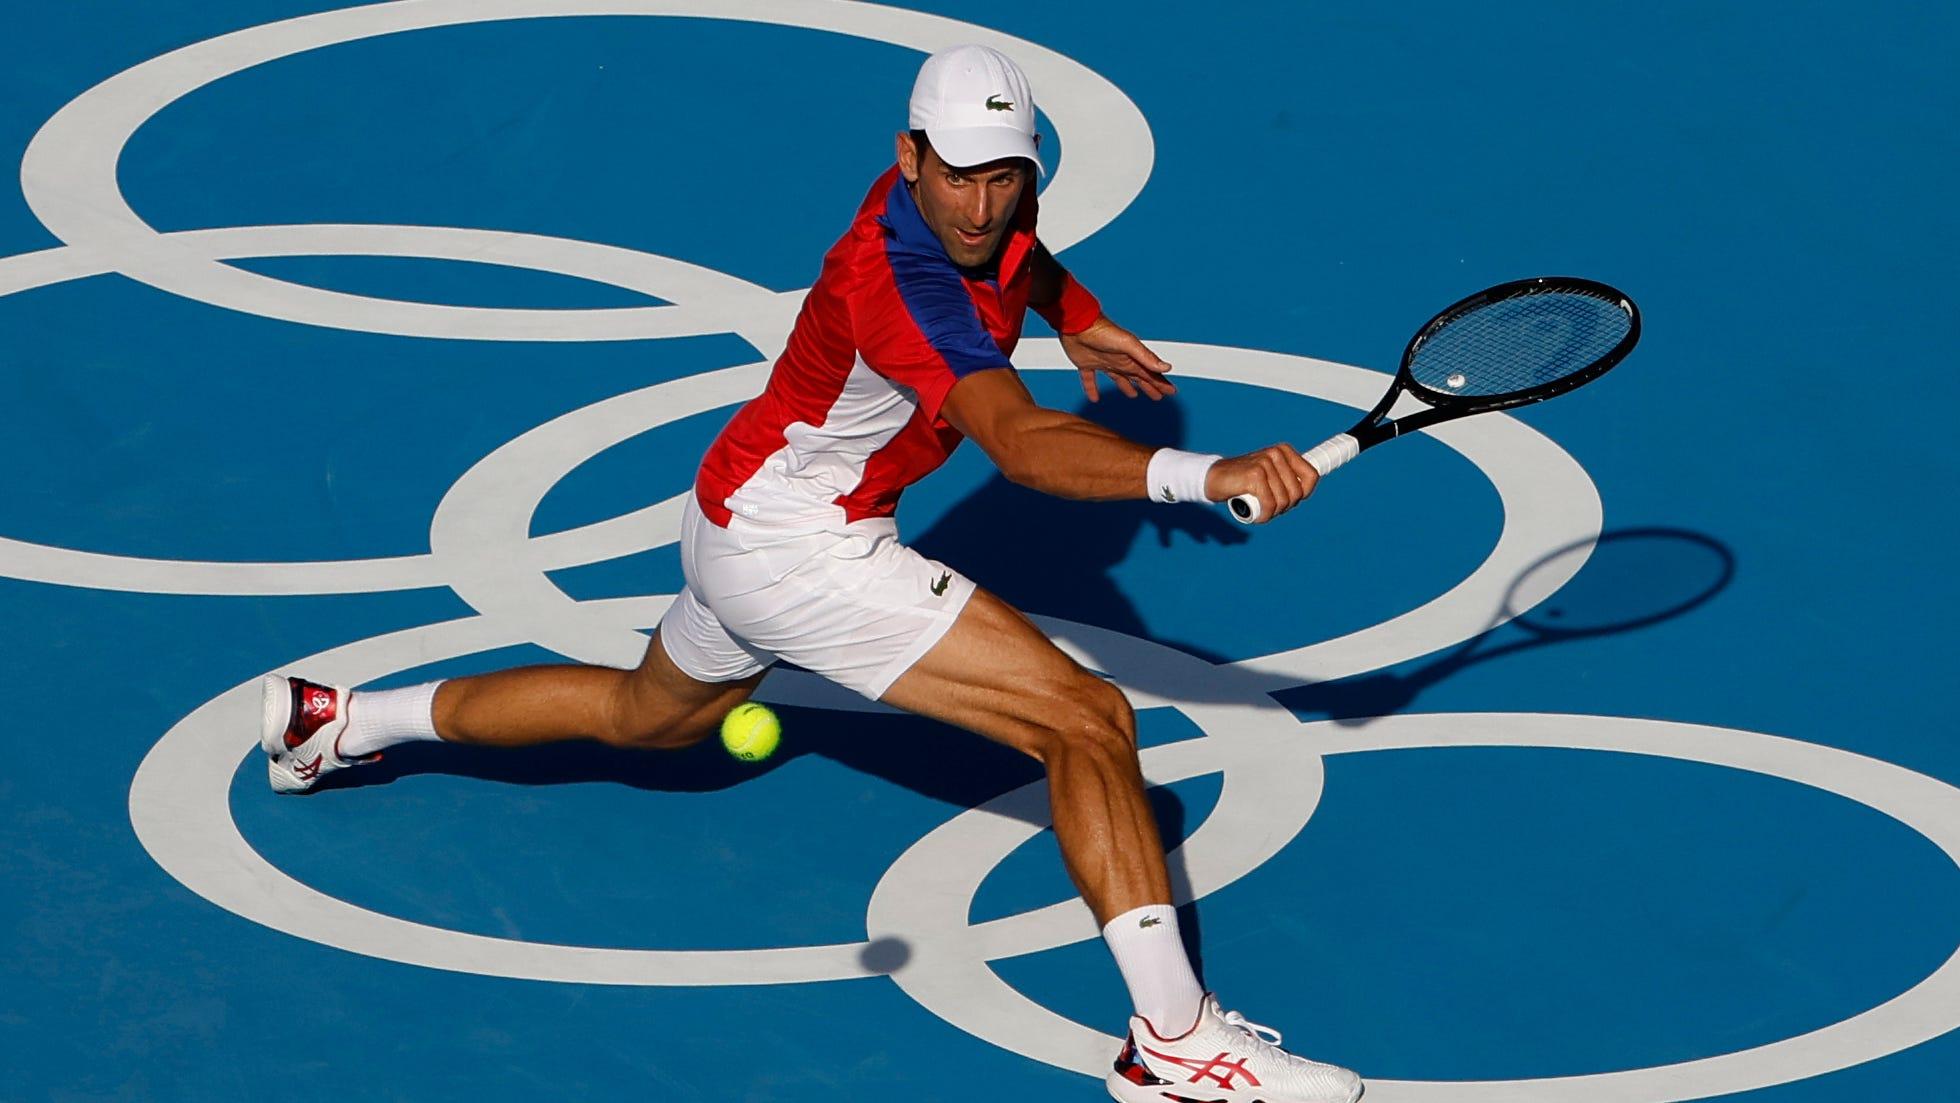 Tokyo 2020 Olympics: Novak Djokovic vs. Alejandro Davidovich Fokina Tennis Pick and Prediction